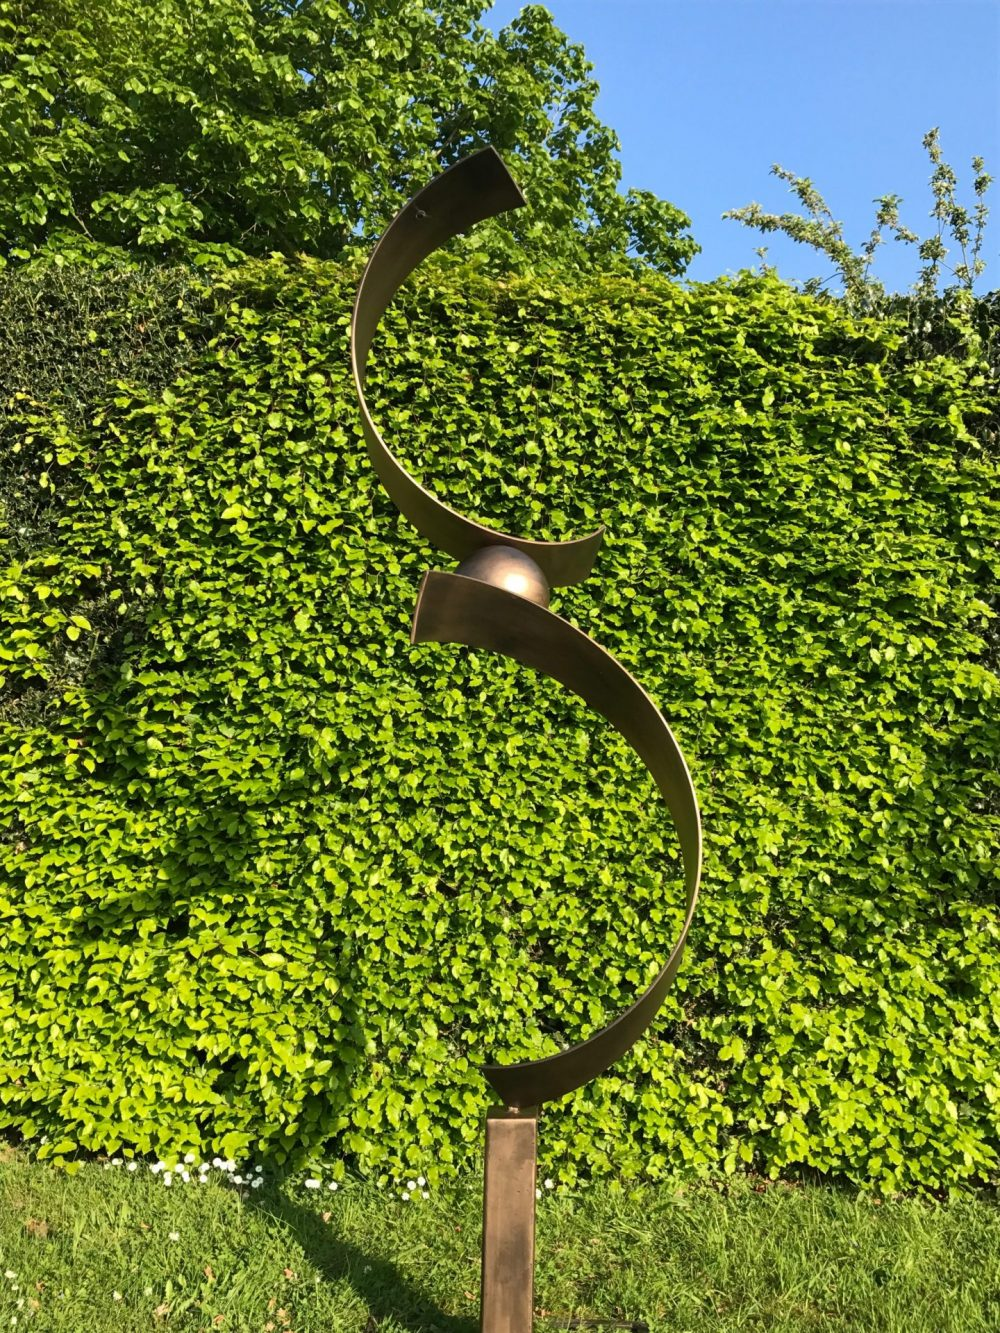 Tall Abstract Spiral Structure Sculpture